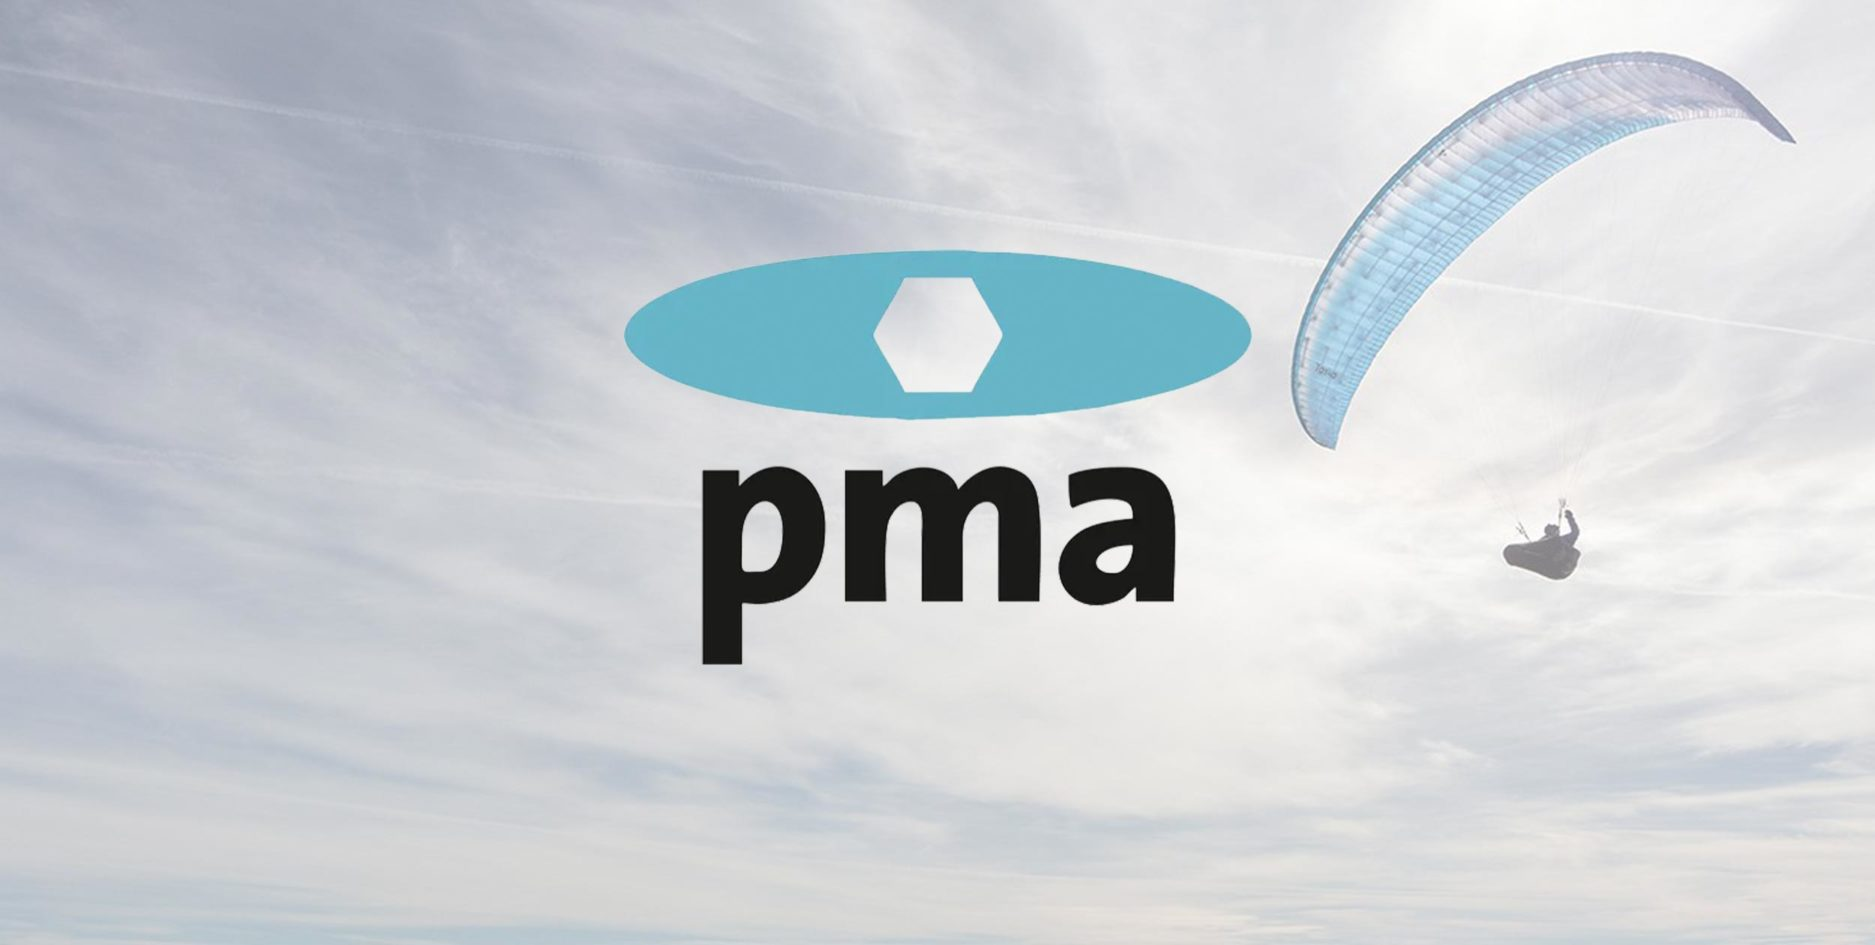 Paraglider Manufacturers Association